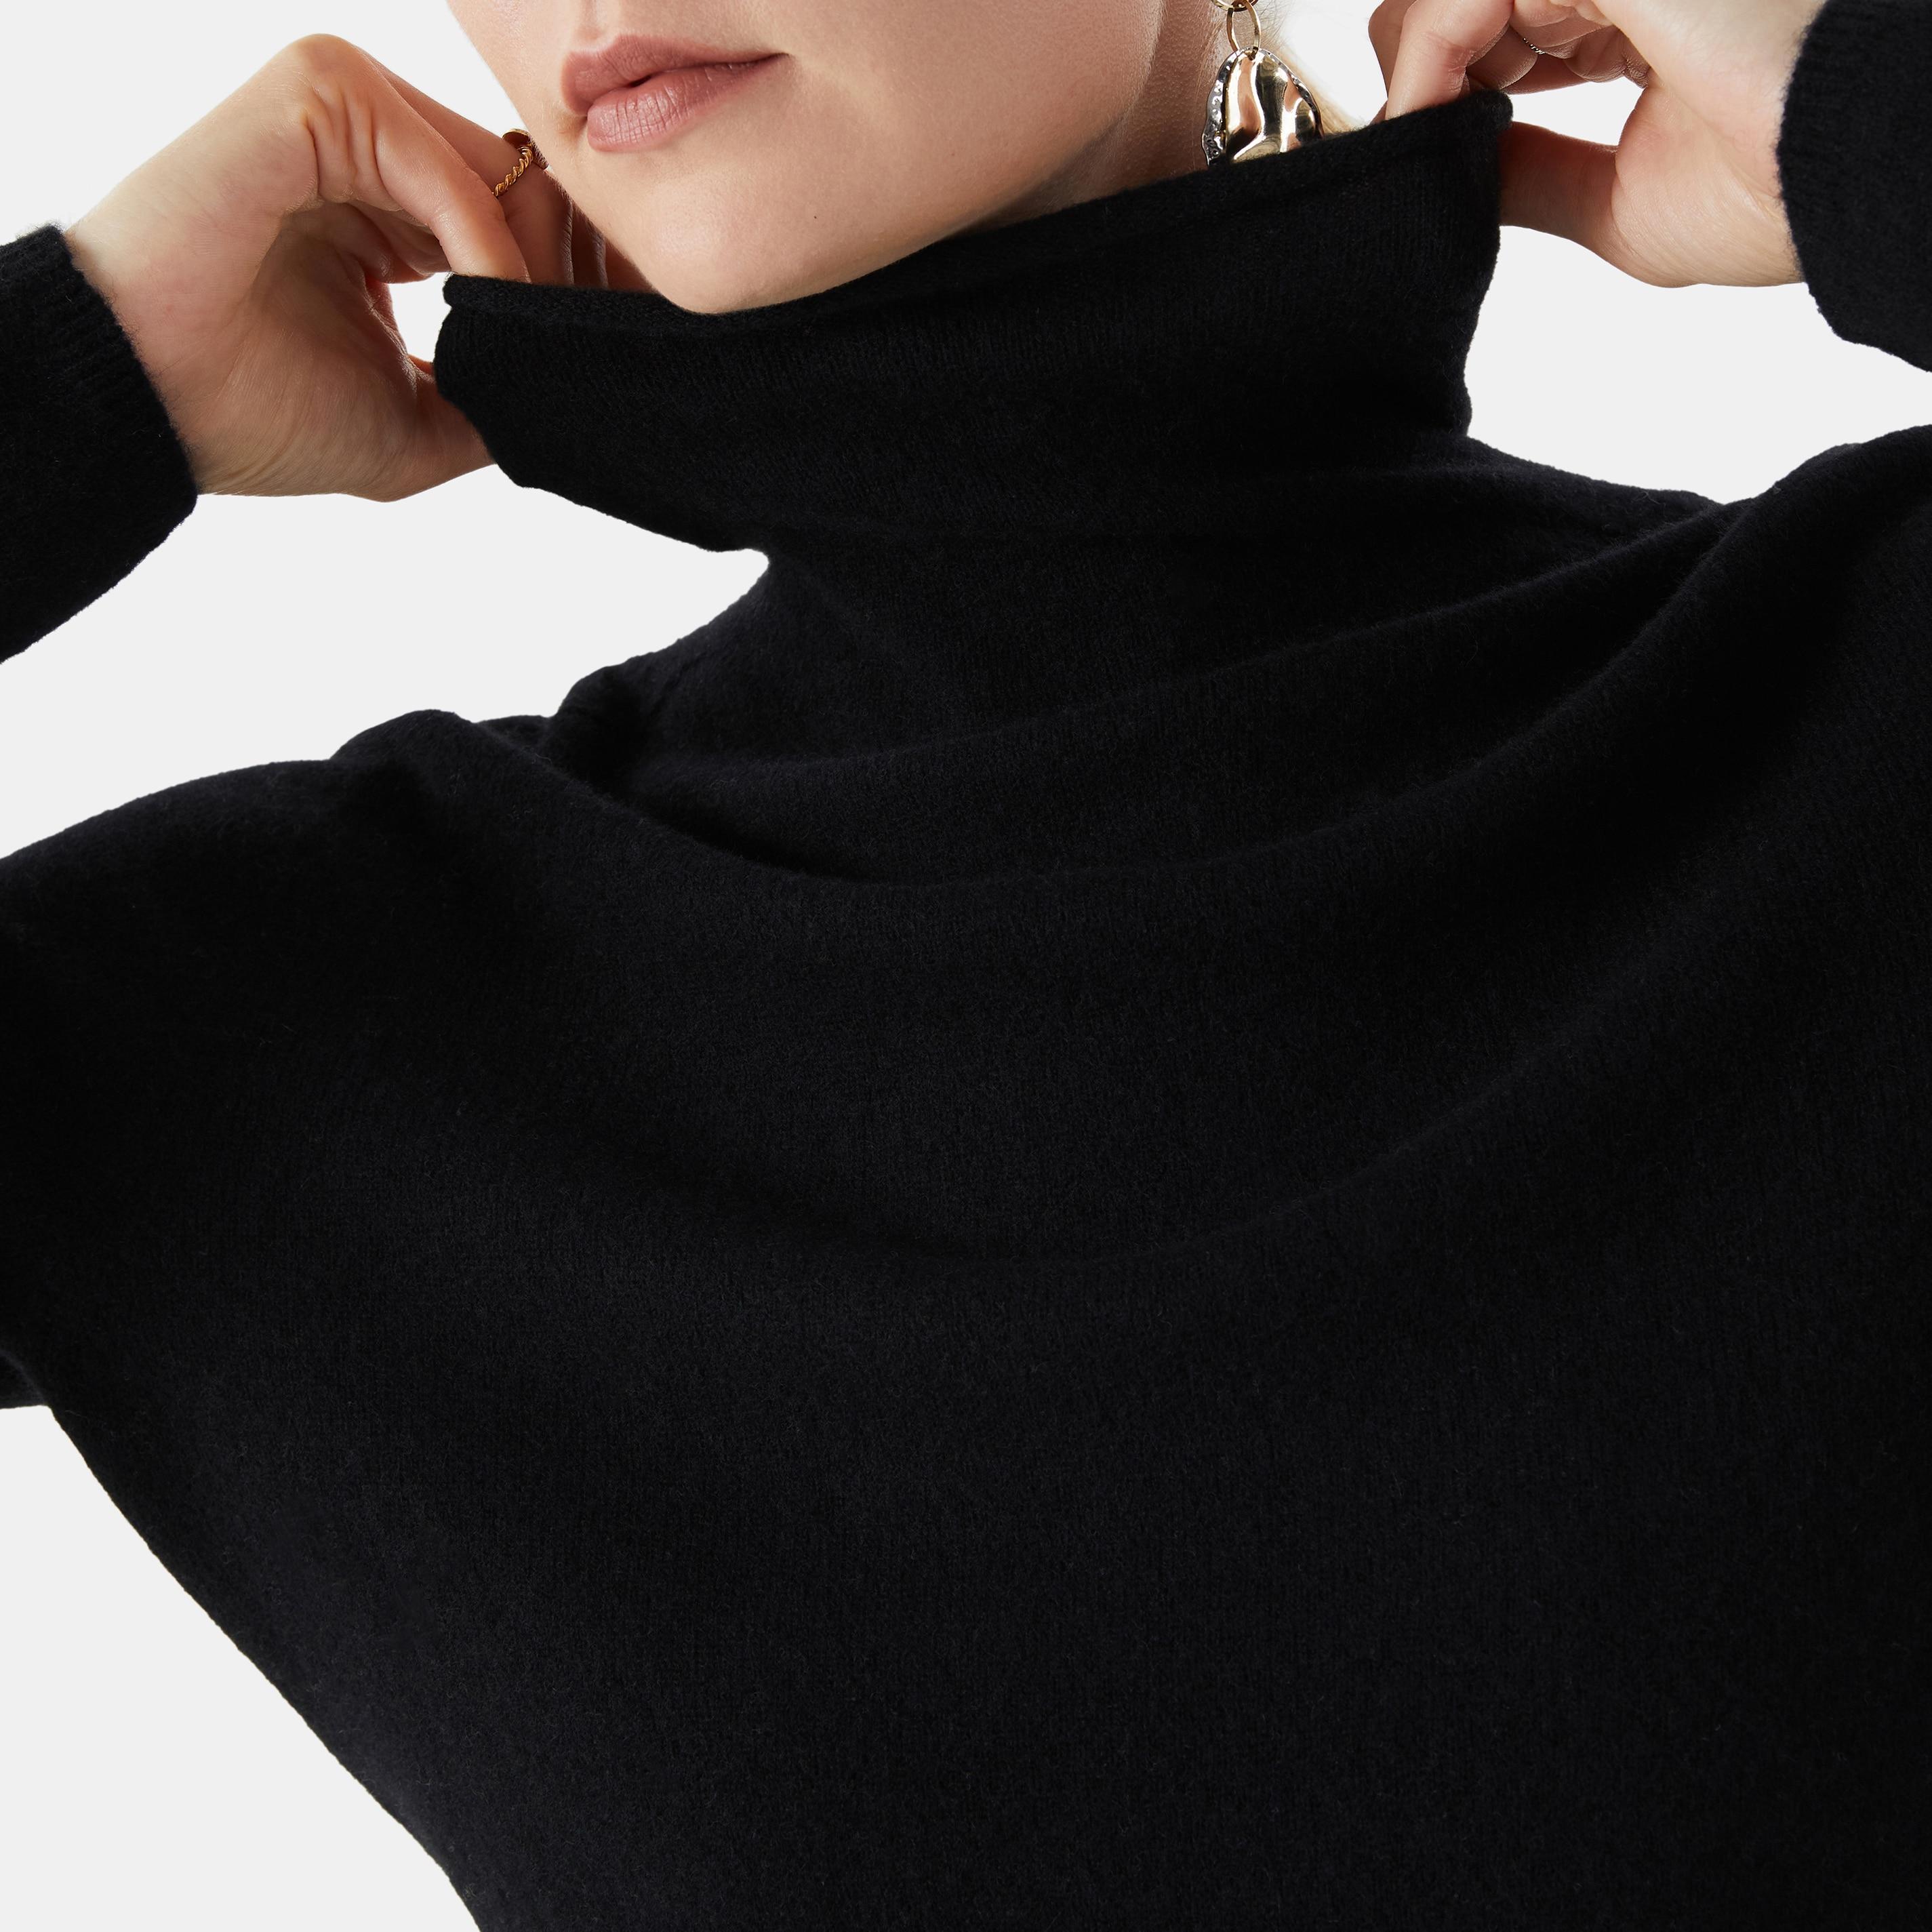 Cashmere Roll Neck Top-Solid Black - Solid Black S